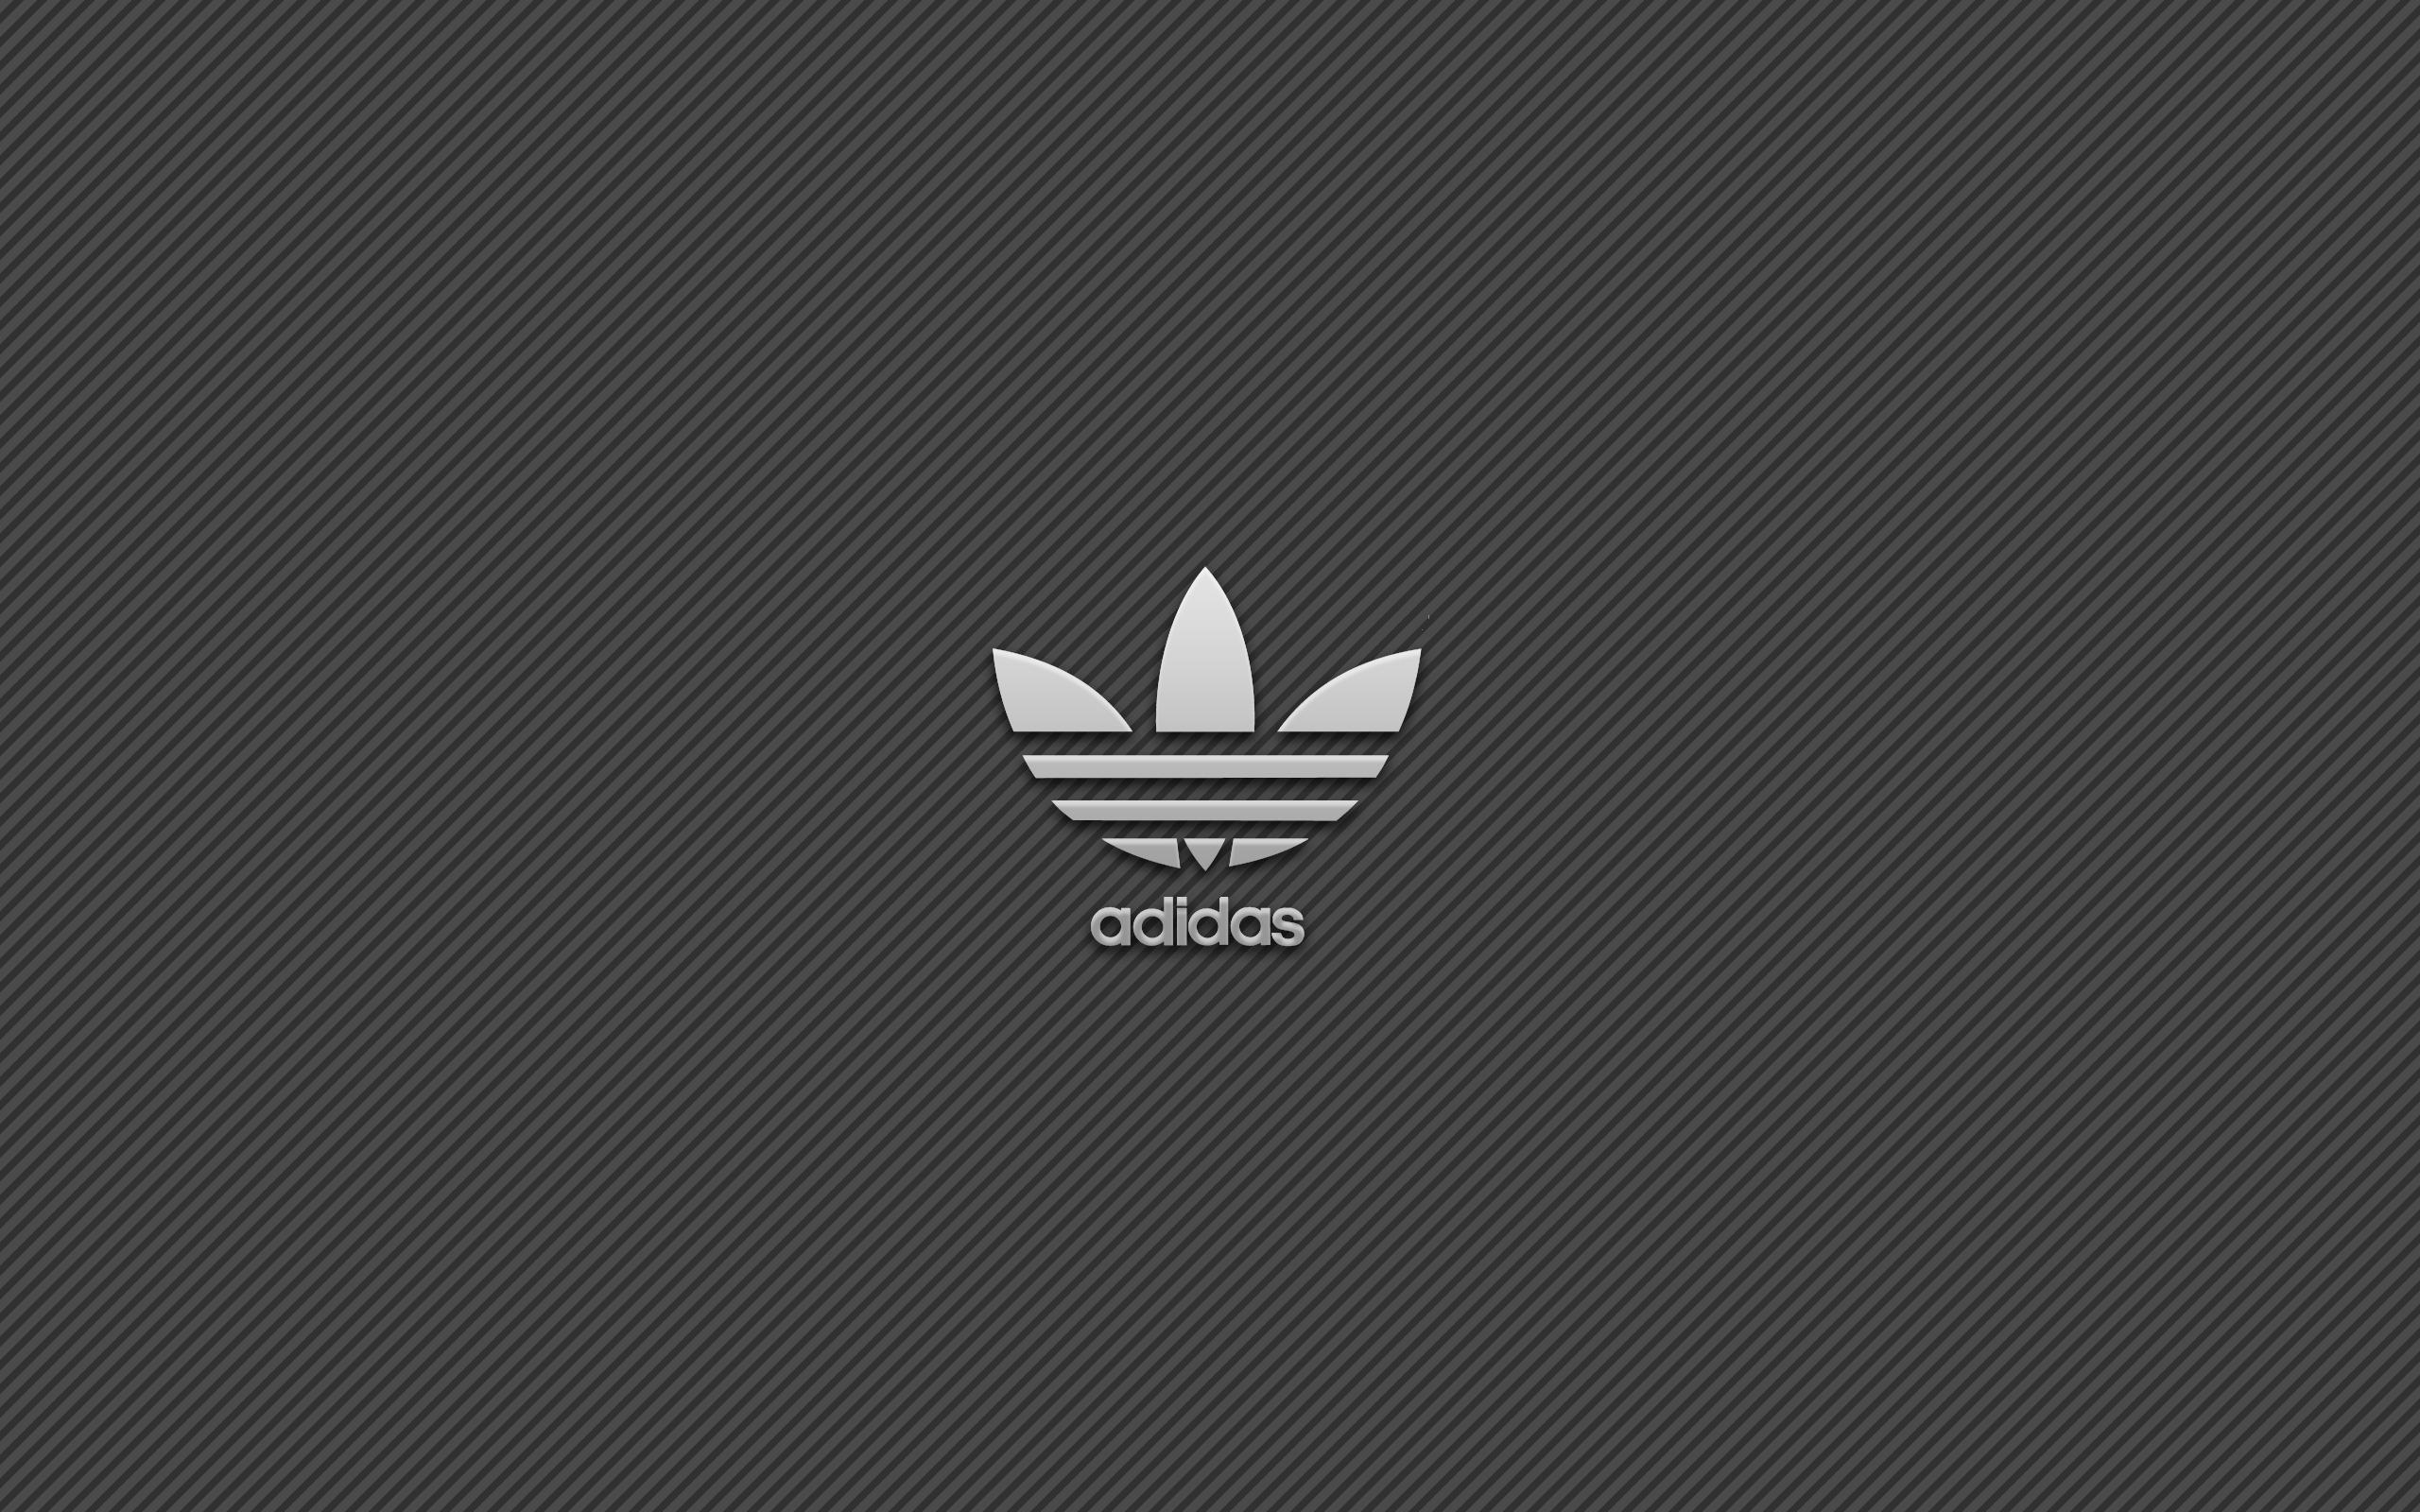 Adidas simple logo background wallpaper 2560x1600 4192 2560x1600